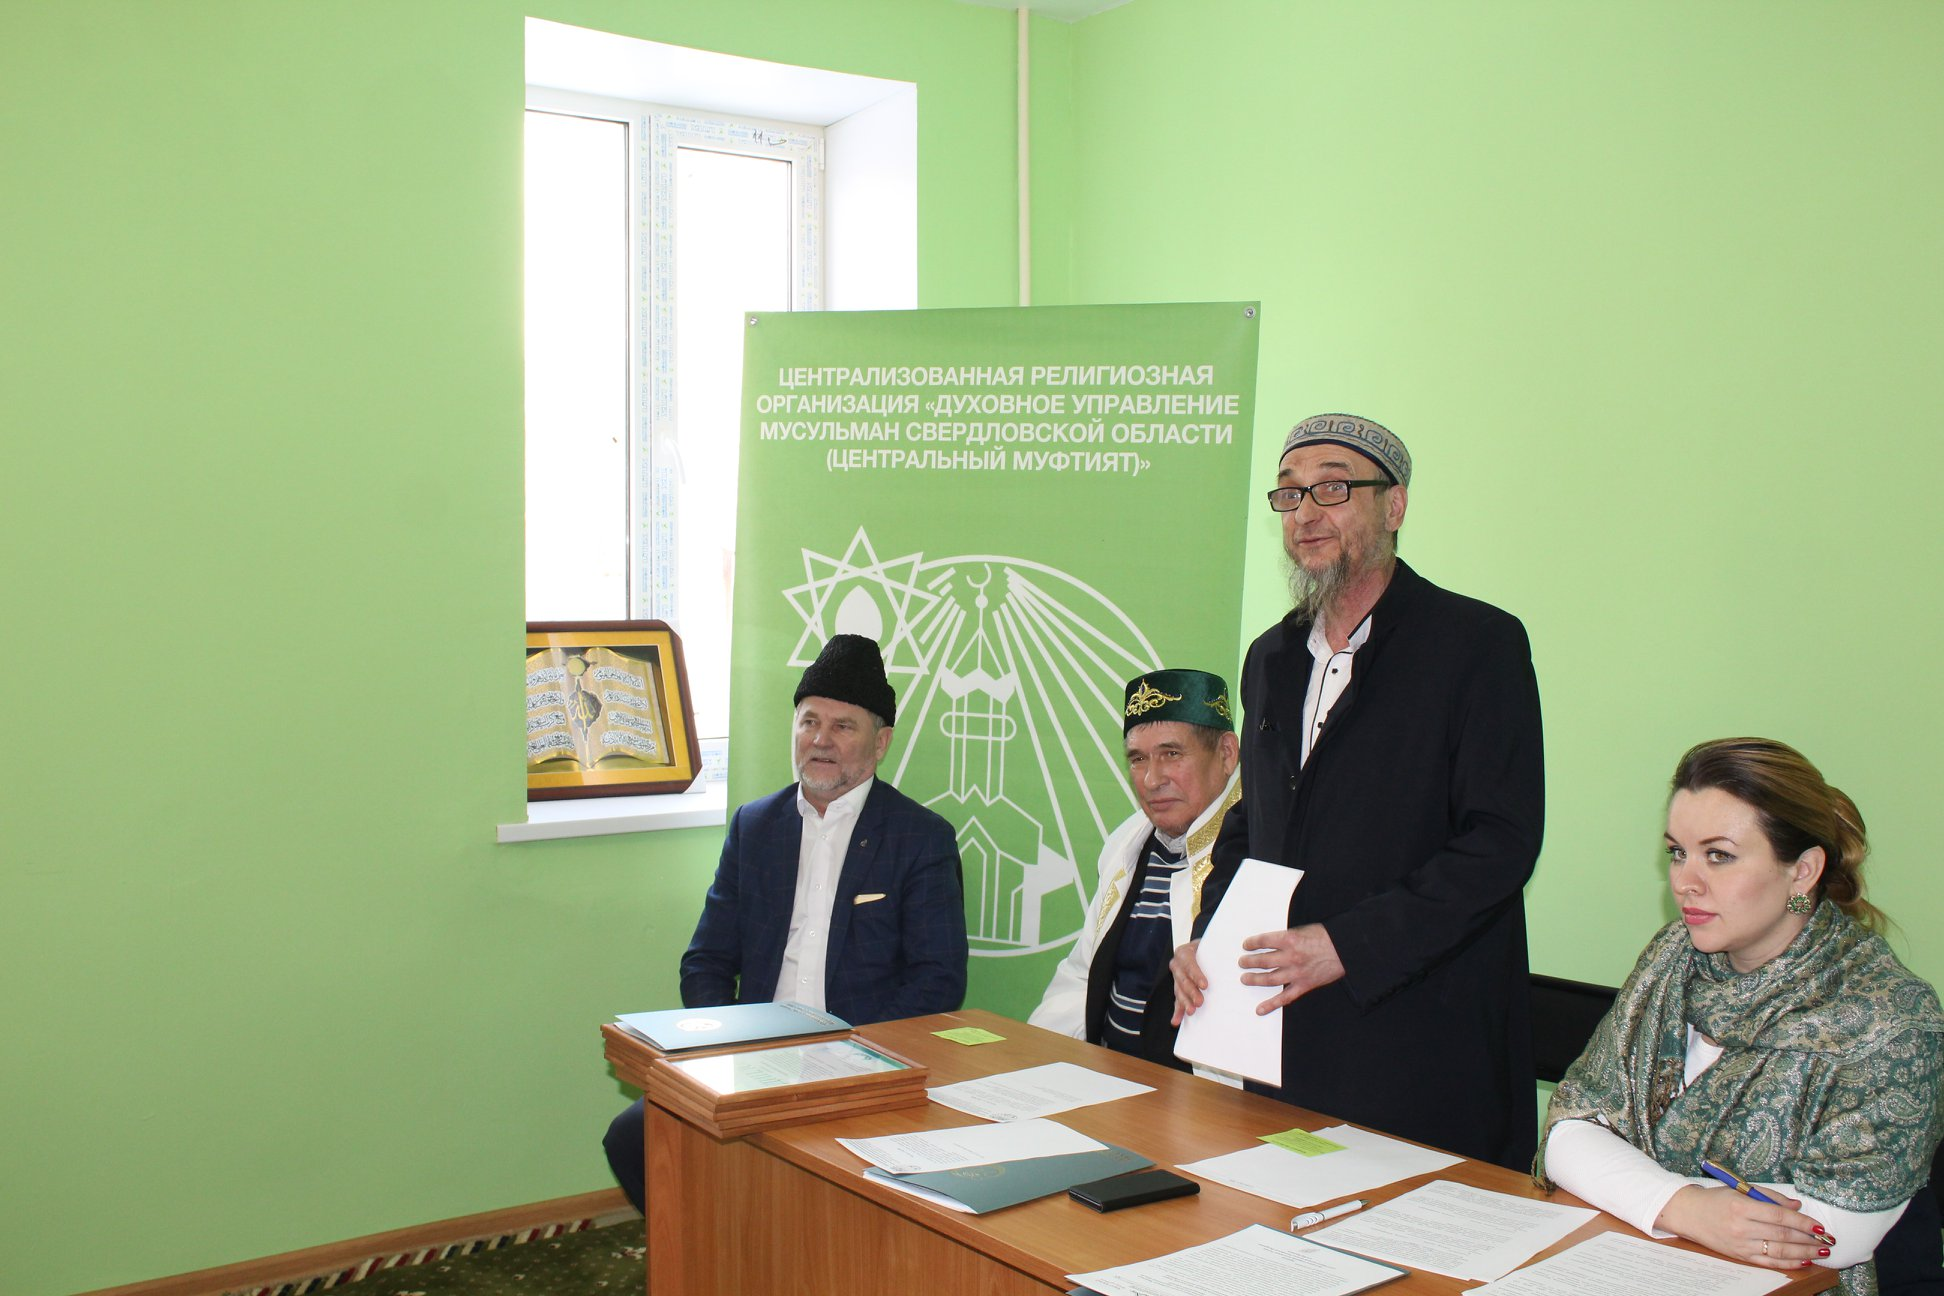 Абдуль-Куддусс Николай Иванович Ашарин отчитался за прошедший срок